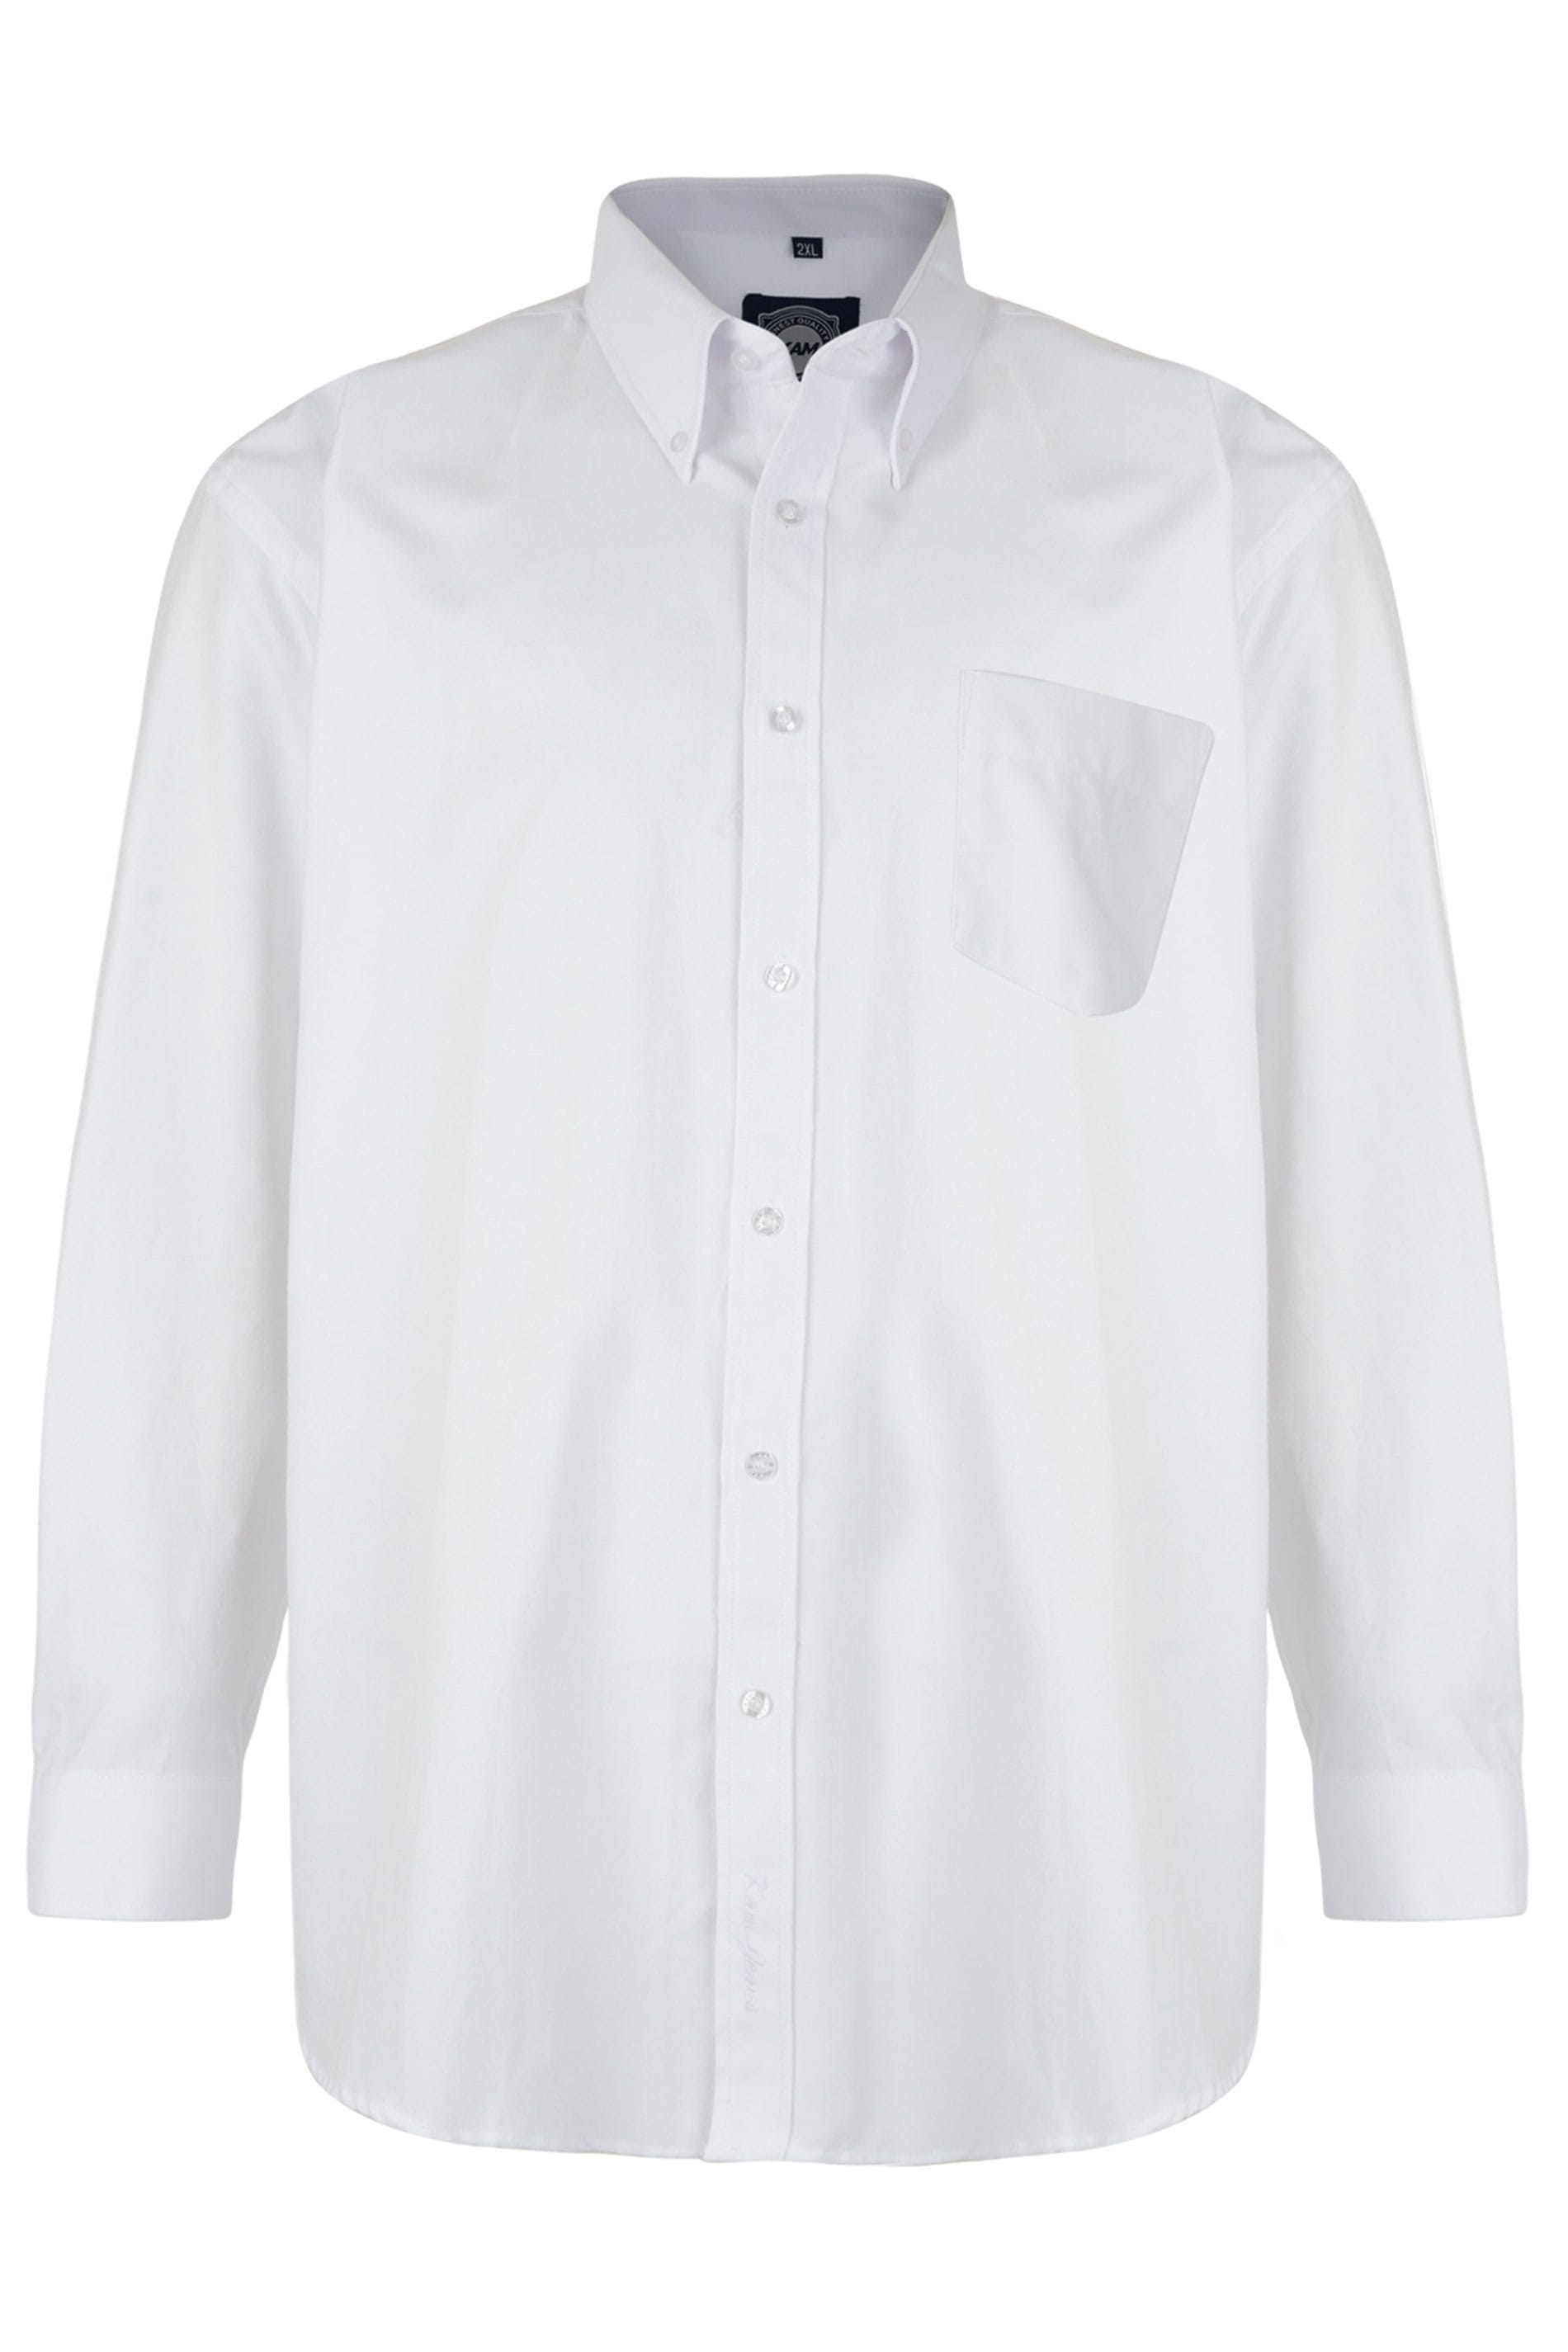 KAM White Oxford Long Sleeve Shirt